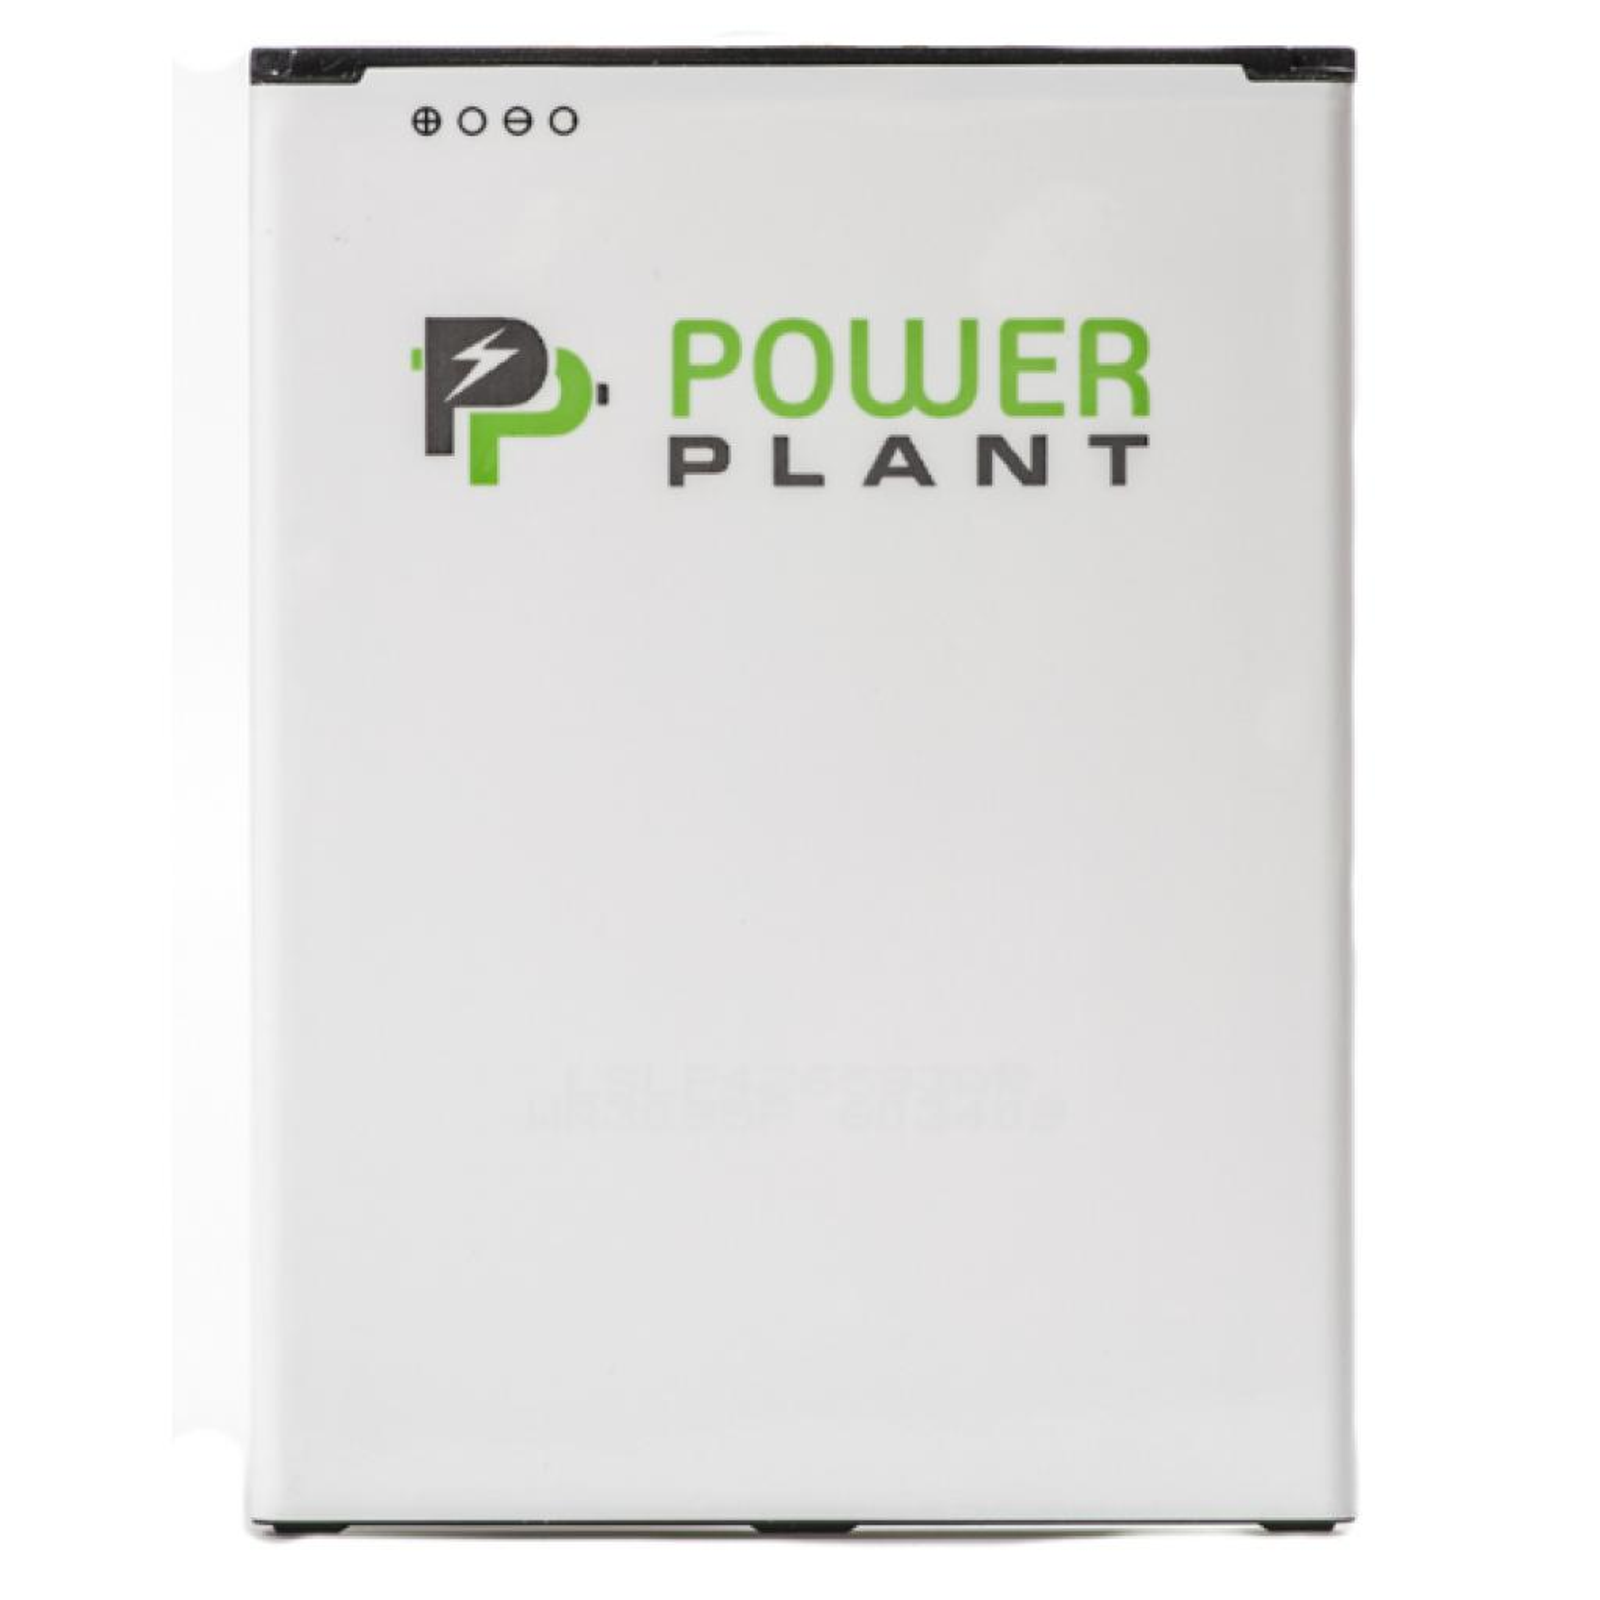 Аккумуляторная батарея PowerPlant Samsung i9200 Galaxy Mega 6.3 (DV00DV6180)